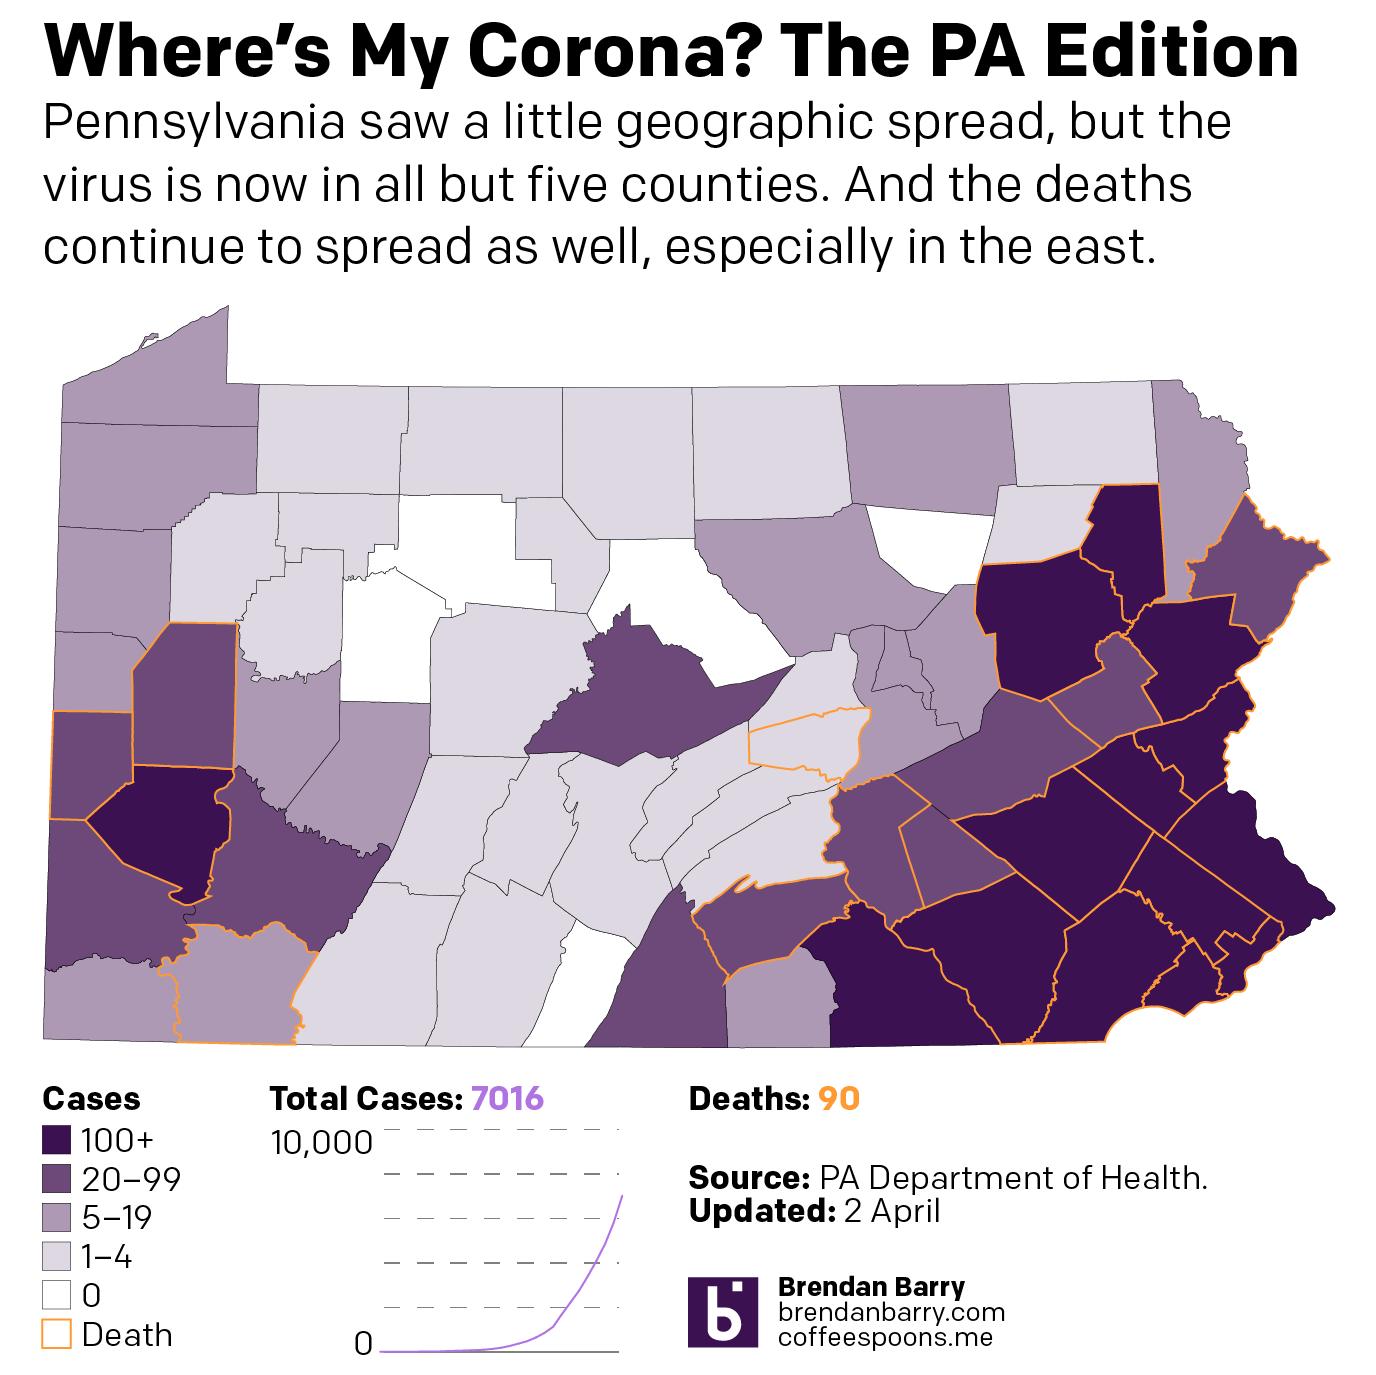 Conditions in Pennsylvania